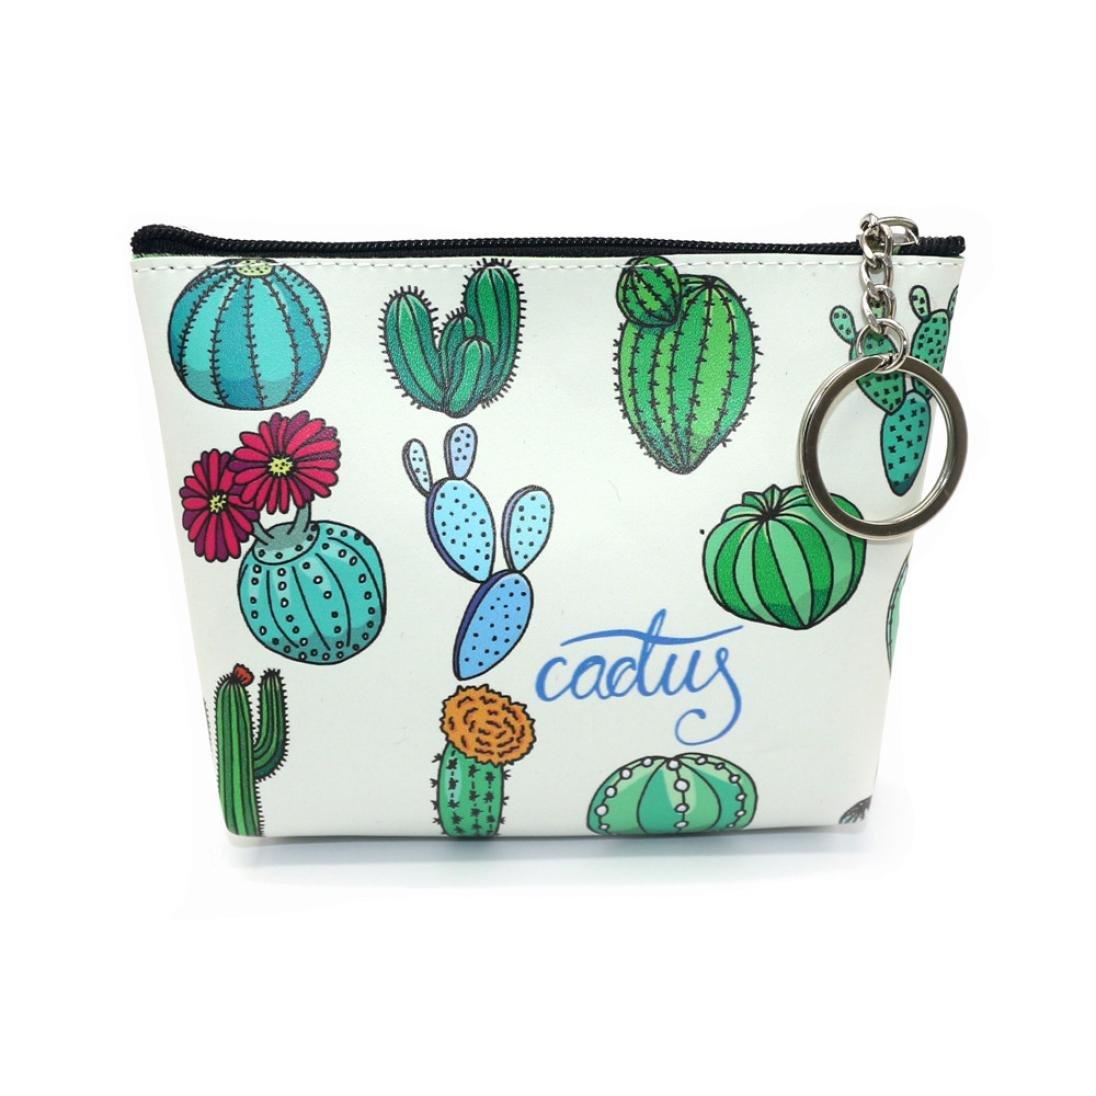 Women Girls Vintage Cute Cartoon Wallet Bag Flower Printed Snacks Coin Purse Change Wallet Pouch Key Holder (F)